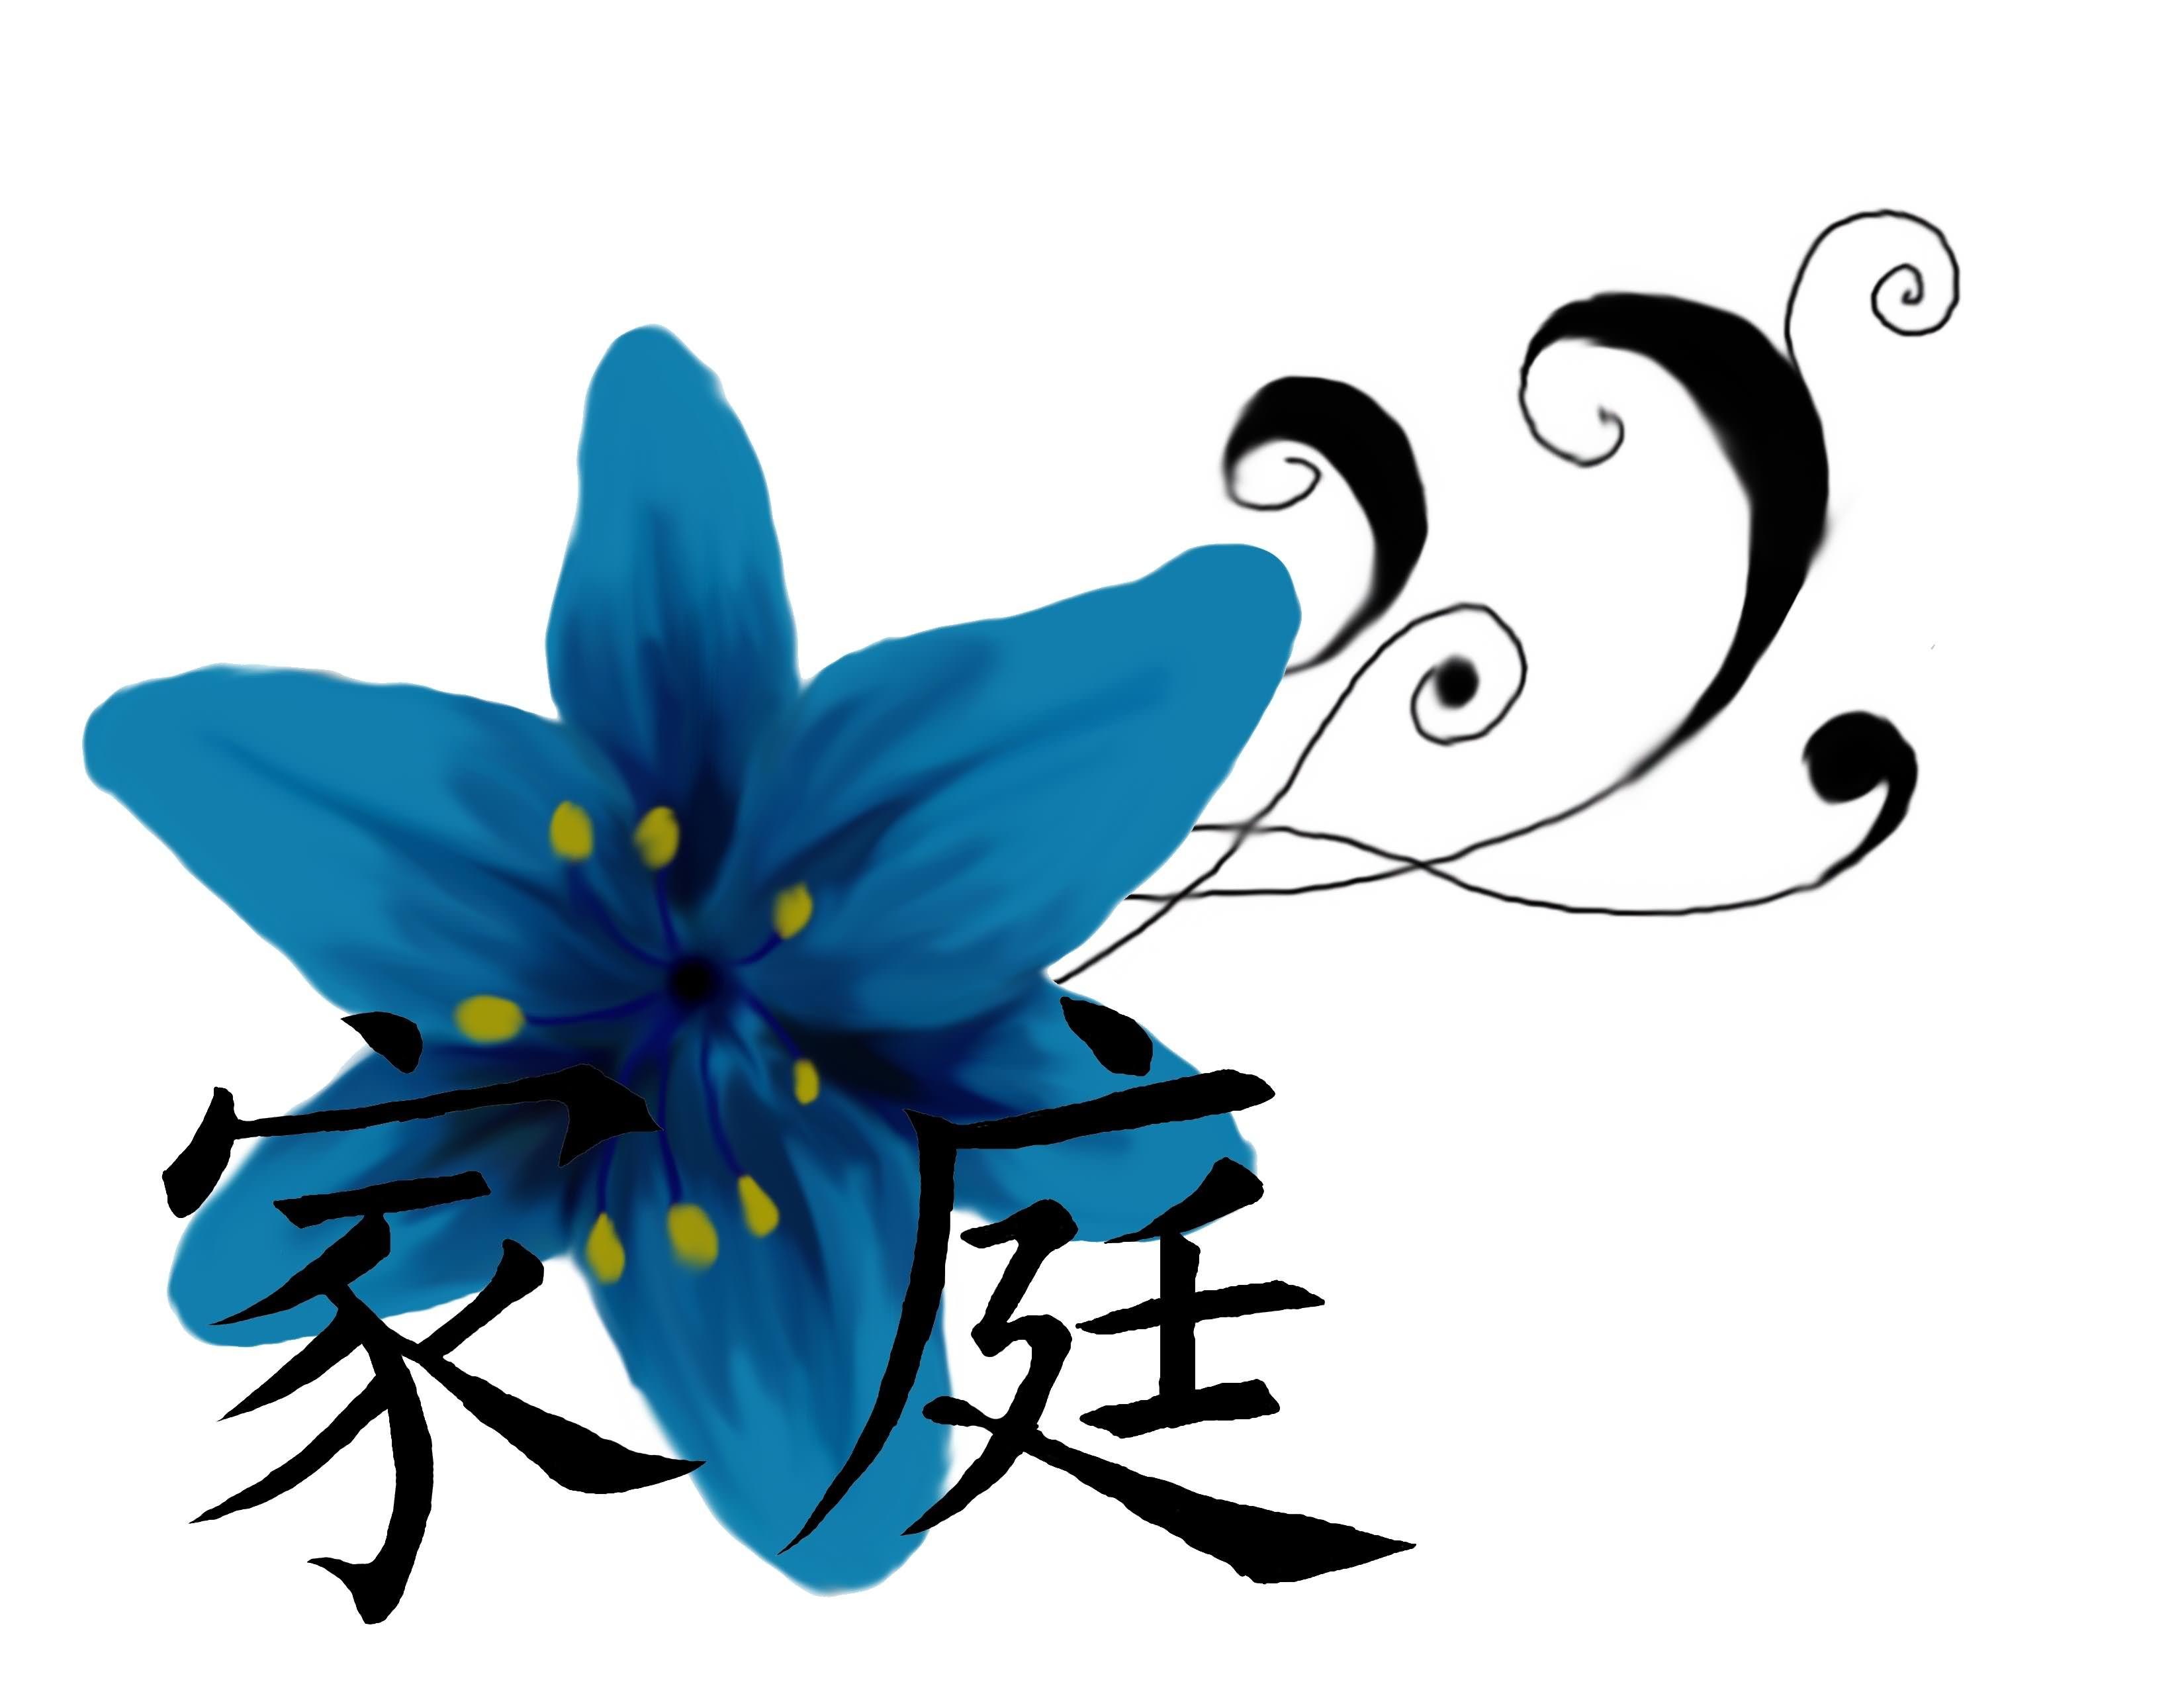 Blue lily flower tattoo design izmirmasajfo